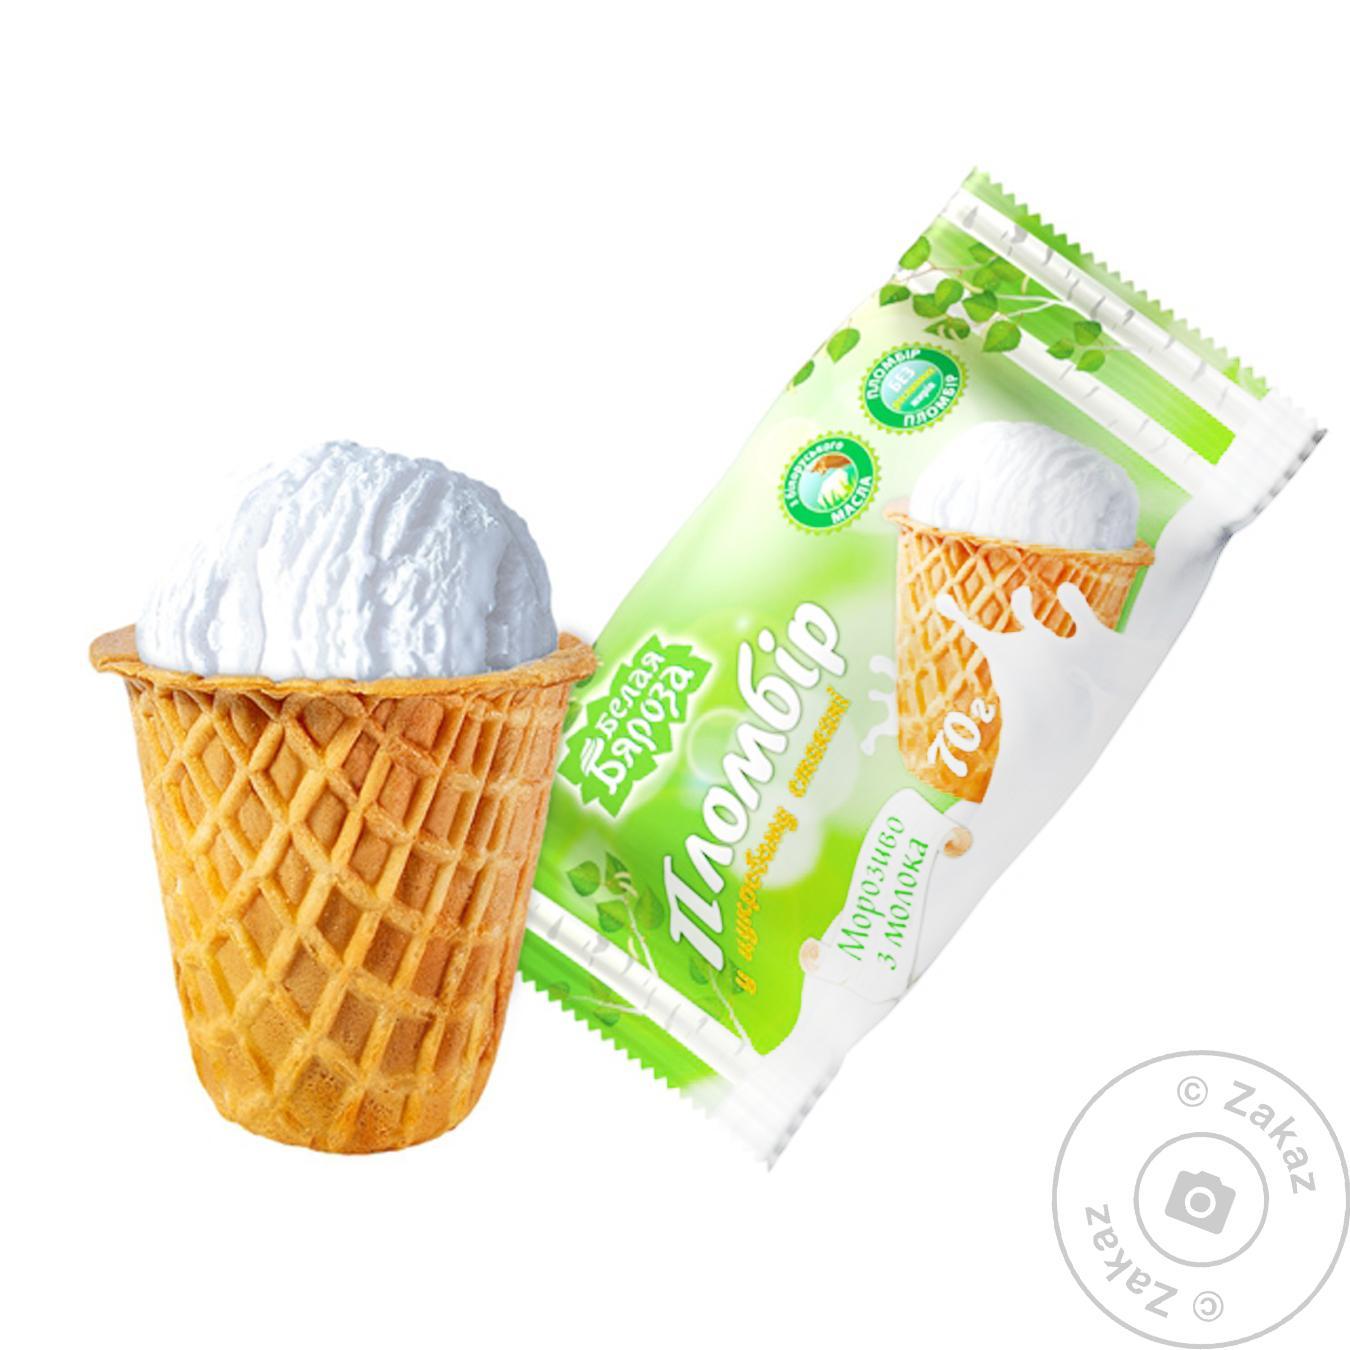 Мороженое Белая Бяроза пломбир в сахарном стакане 70г